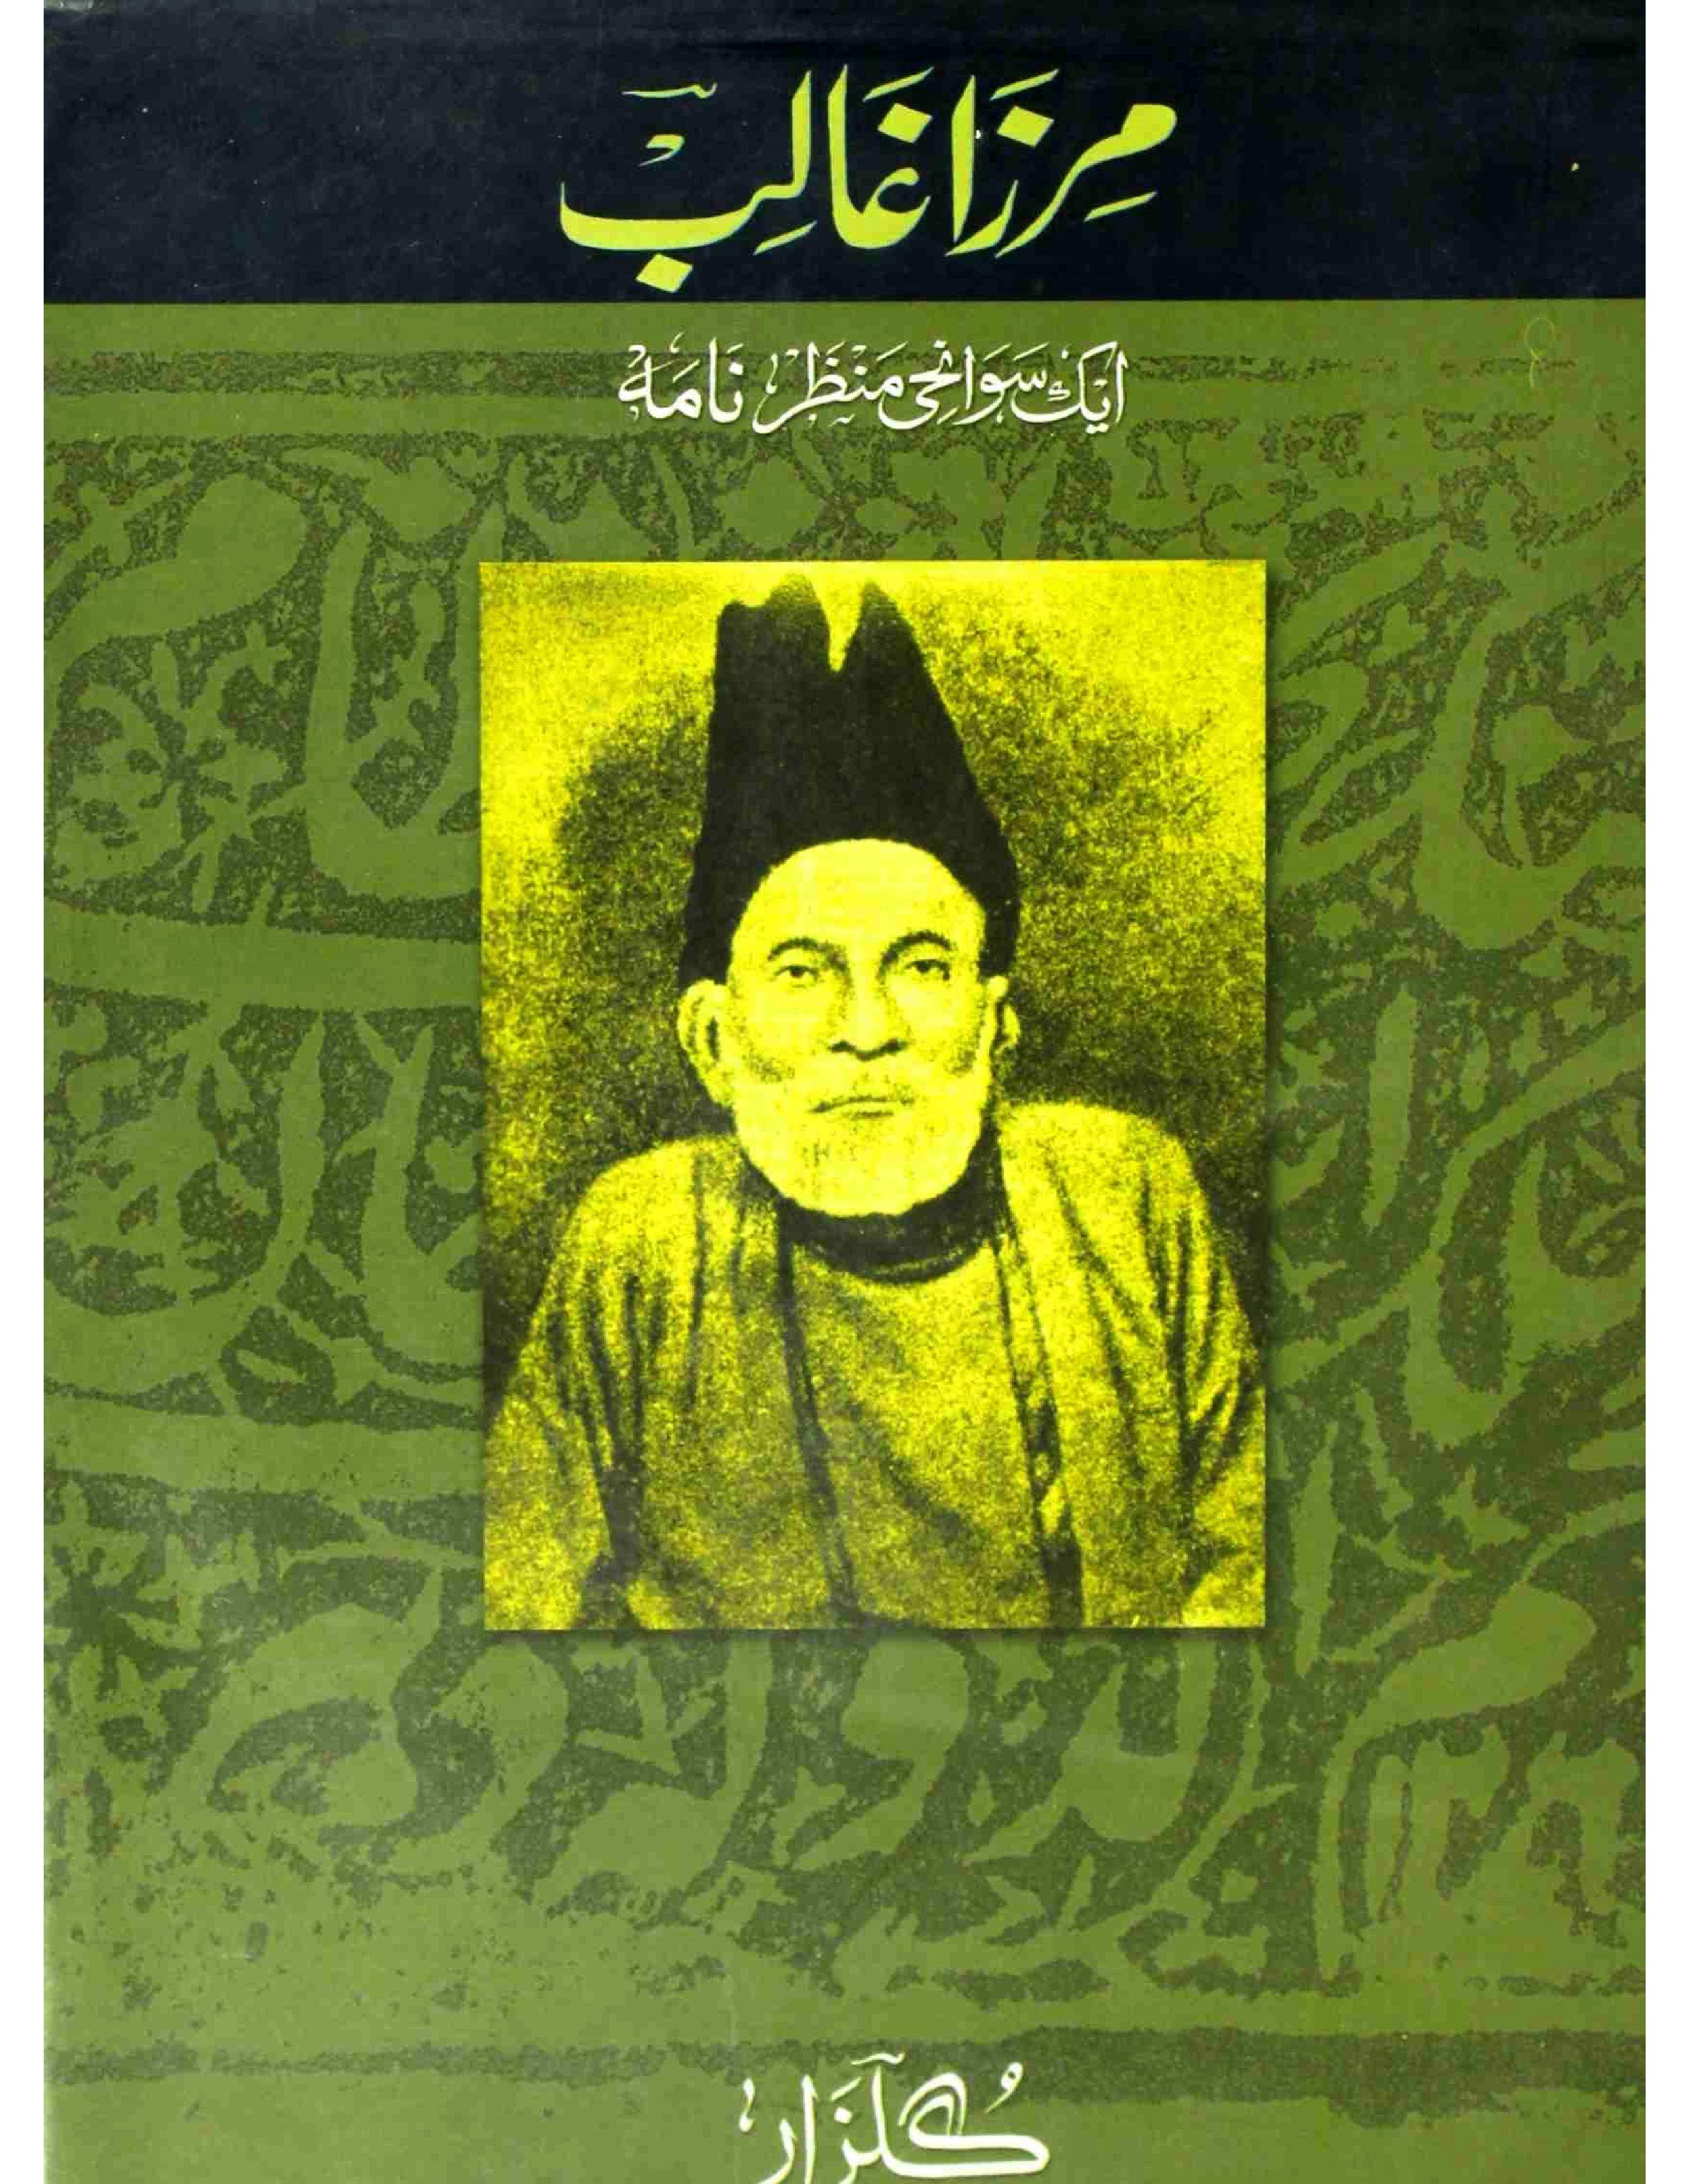 Mirza Ghalib     Ek Swanehi Manzar Nama